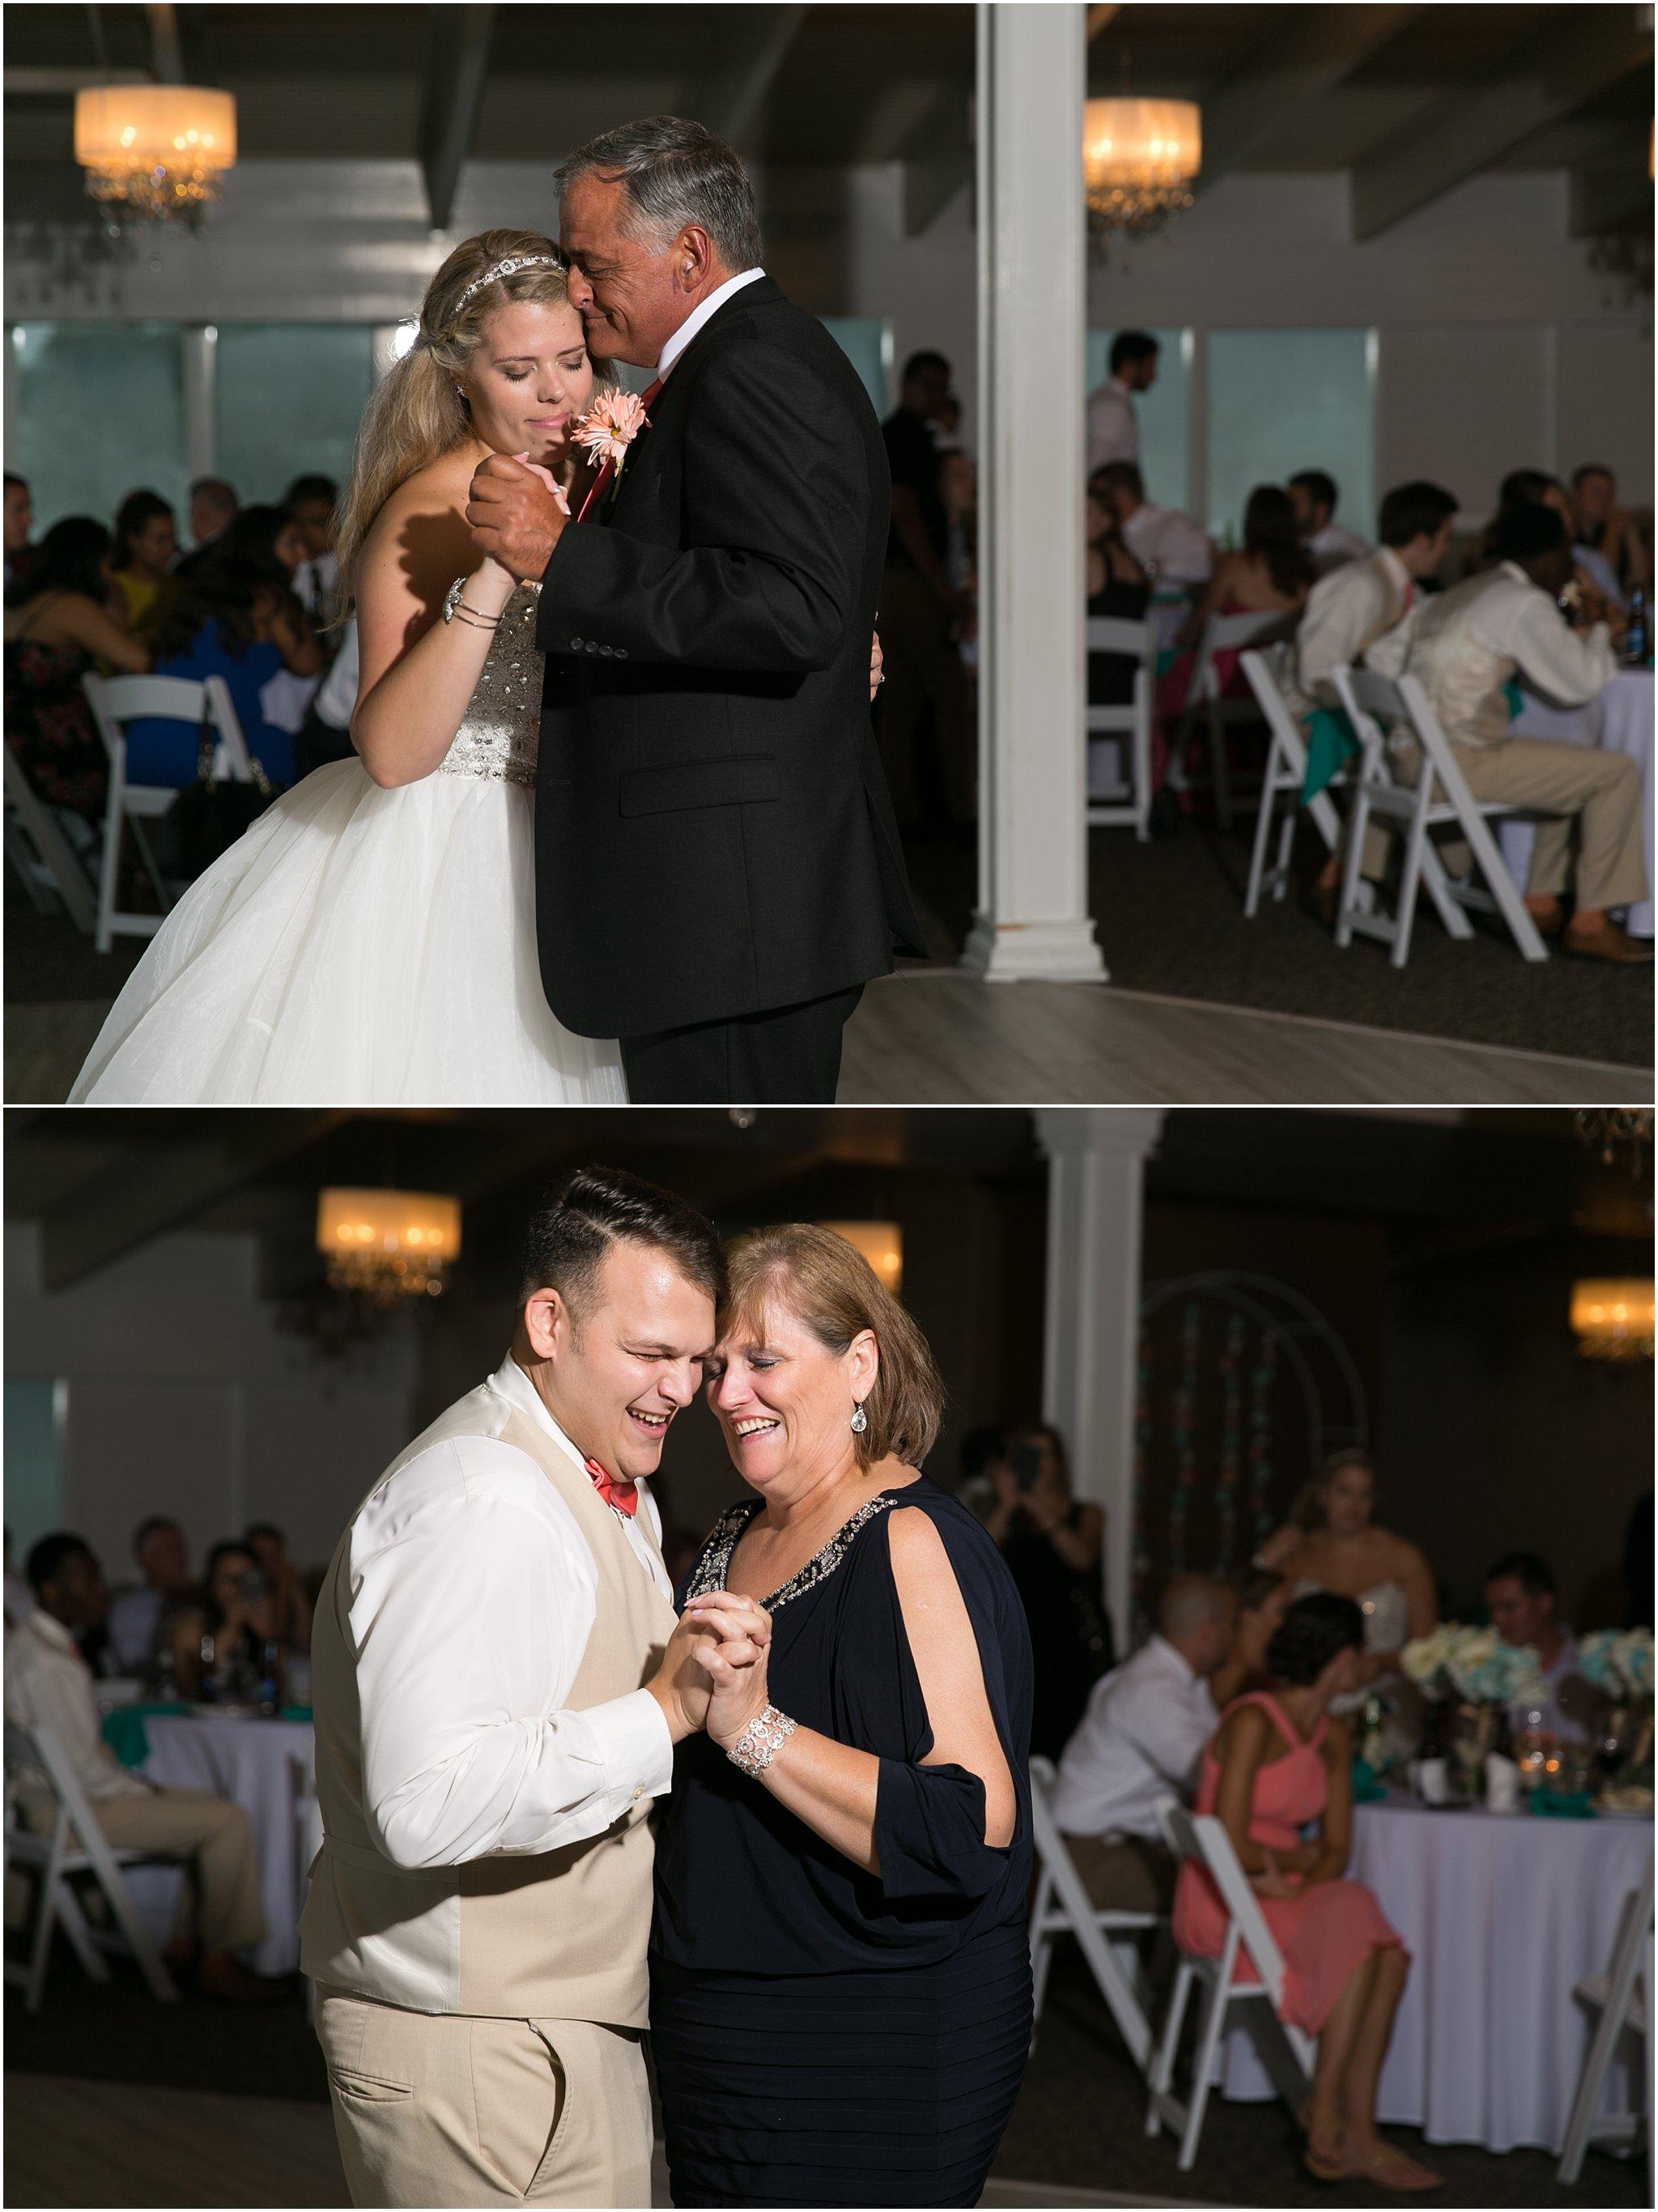 jessica_ryan_photography_wedding_hampton_roads_virginia_virginia_beach_weddings_0632